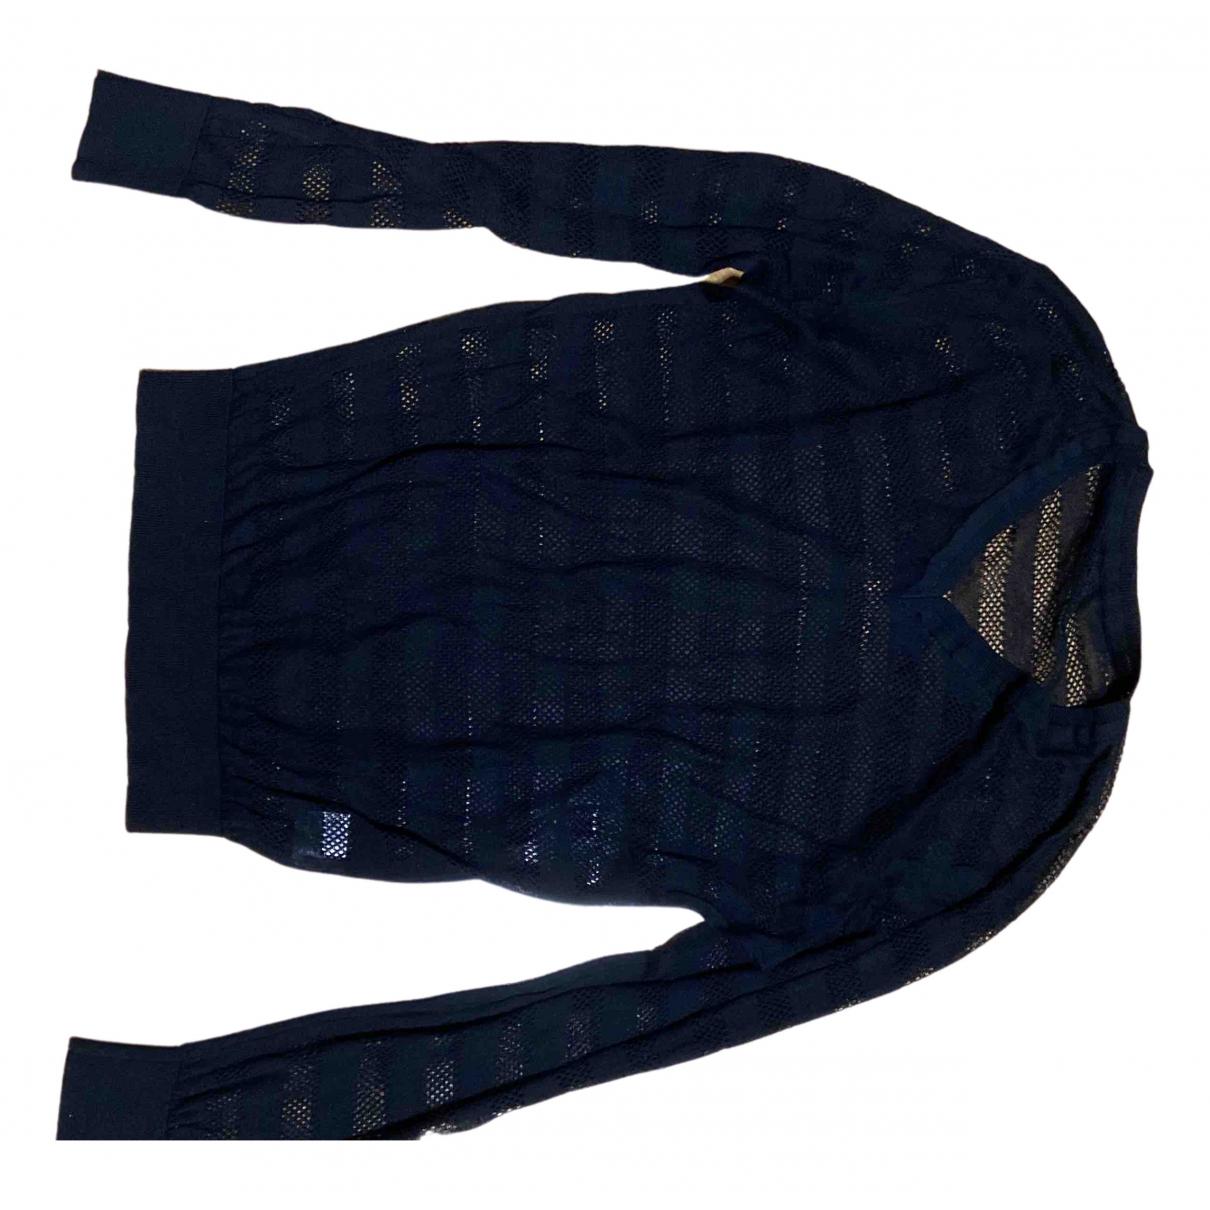 Dior Homme \N Black Cotton Knitwear & Sweatshirts for Men 46 IT